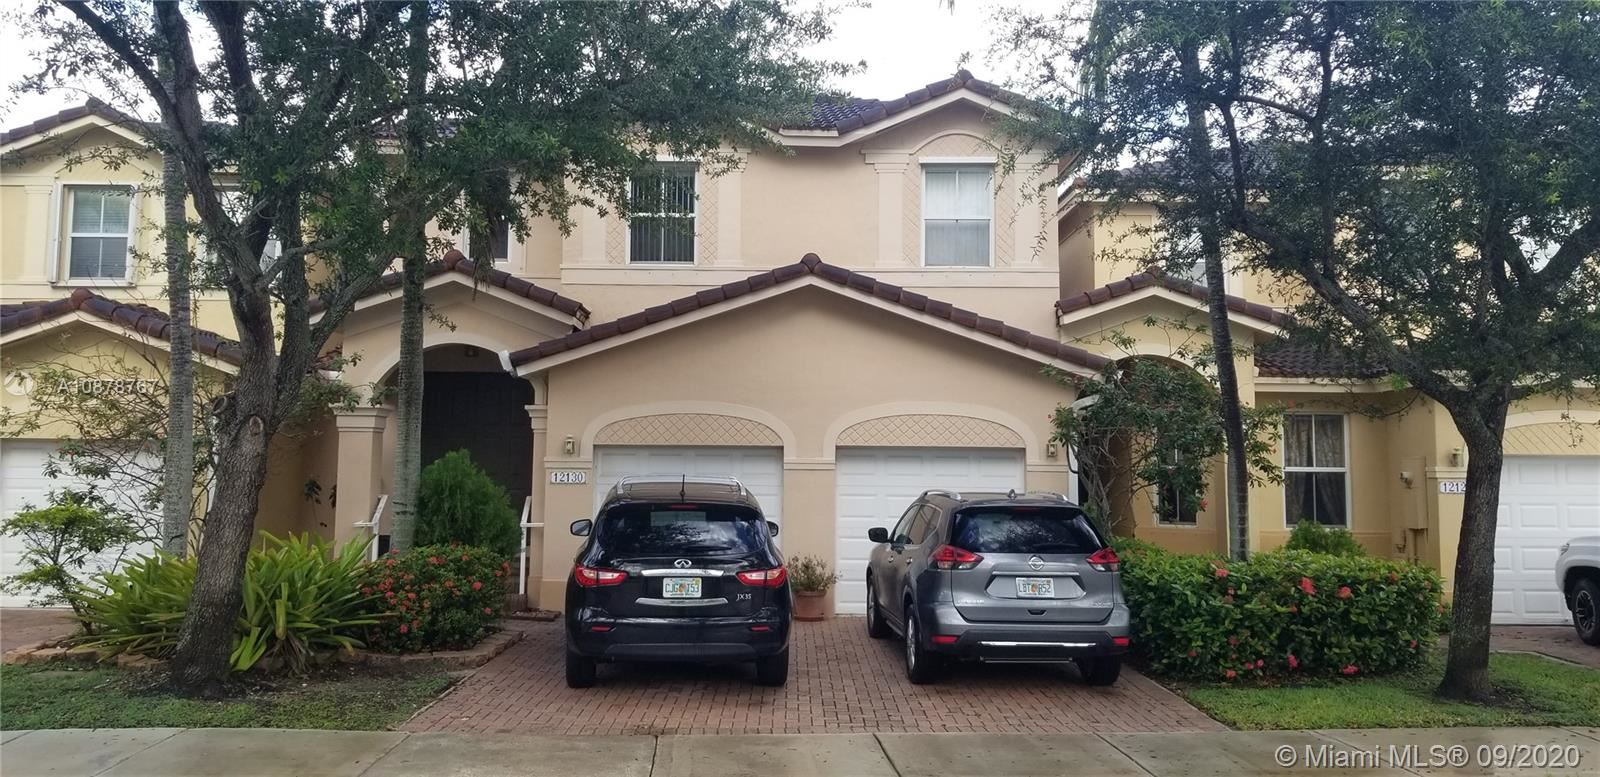 12130 SW 122nd Path #12130, Miami, FL 33186 - #: A10878767